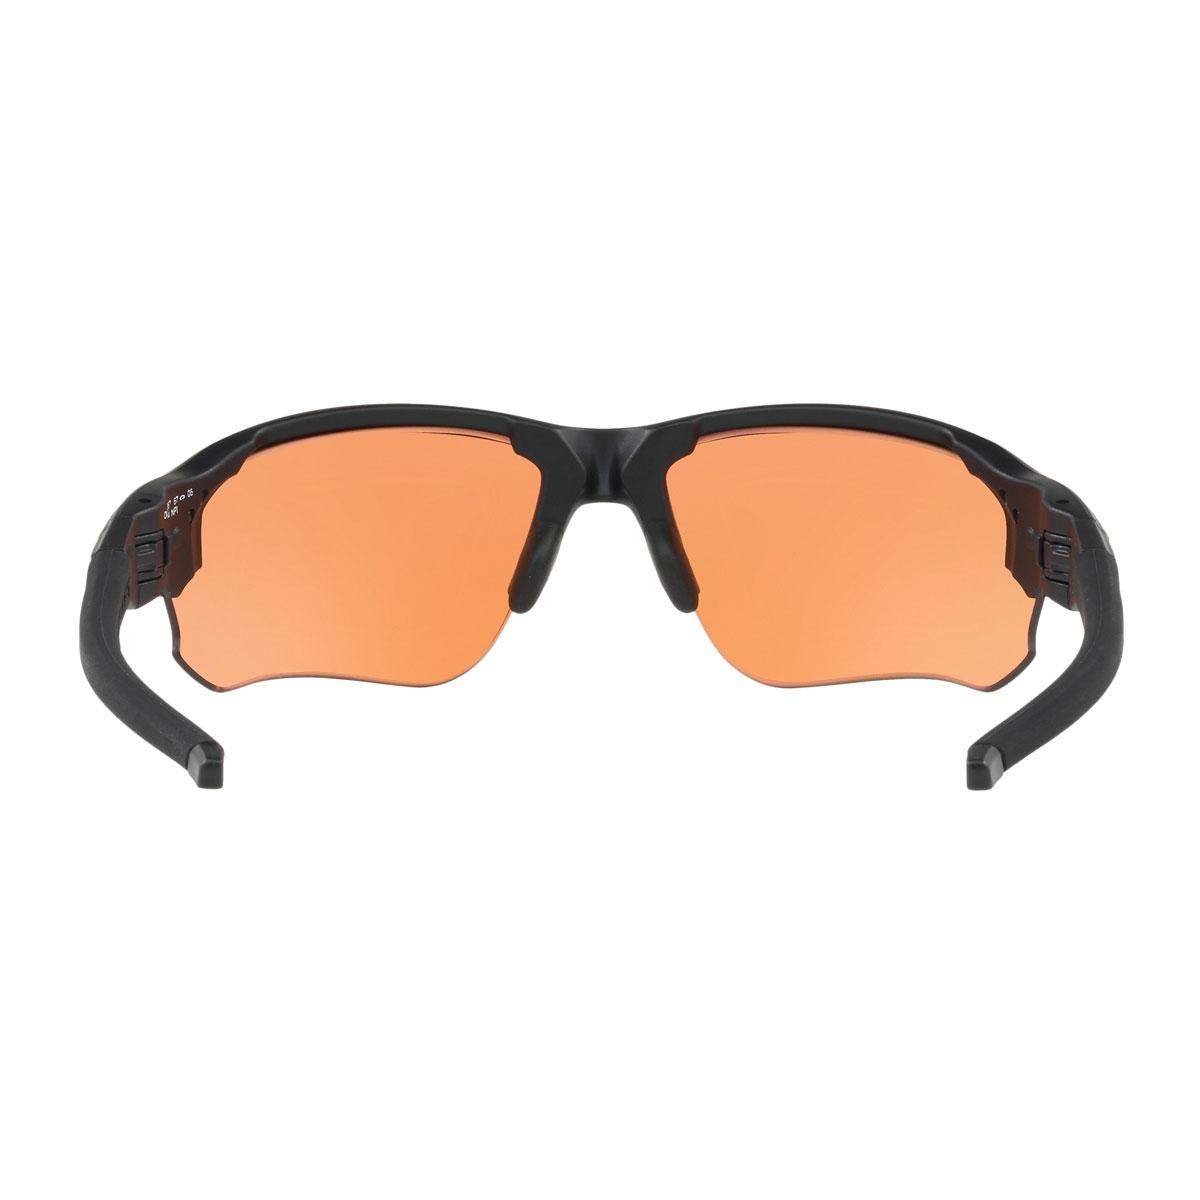 9a4c805d8ab ... Image of Oakley Flak Draft Prizm Trail Polarized Sunglasses - Indigo  Blue Frames Prizm Trail ...